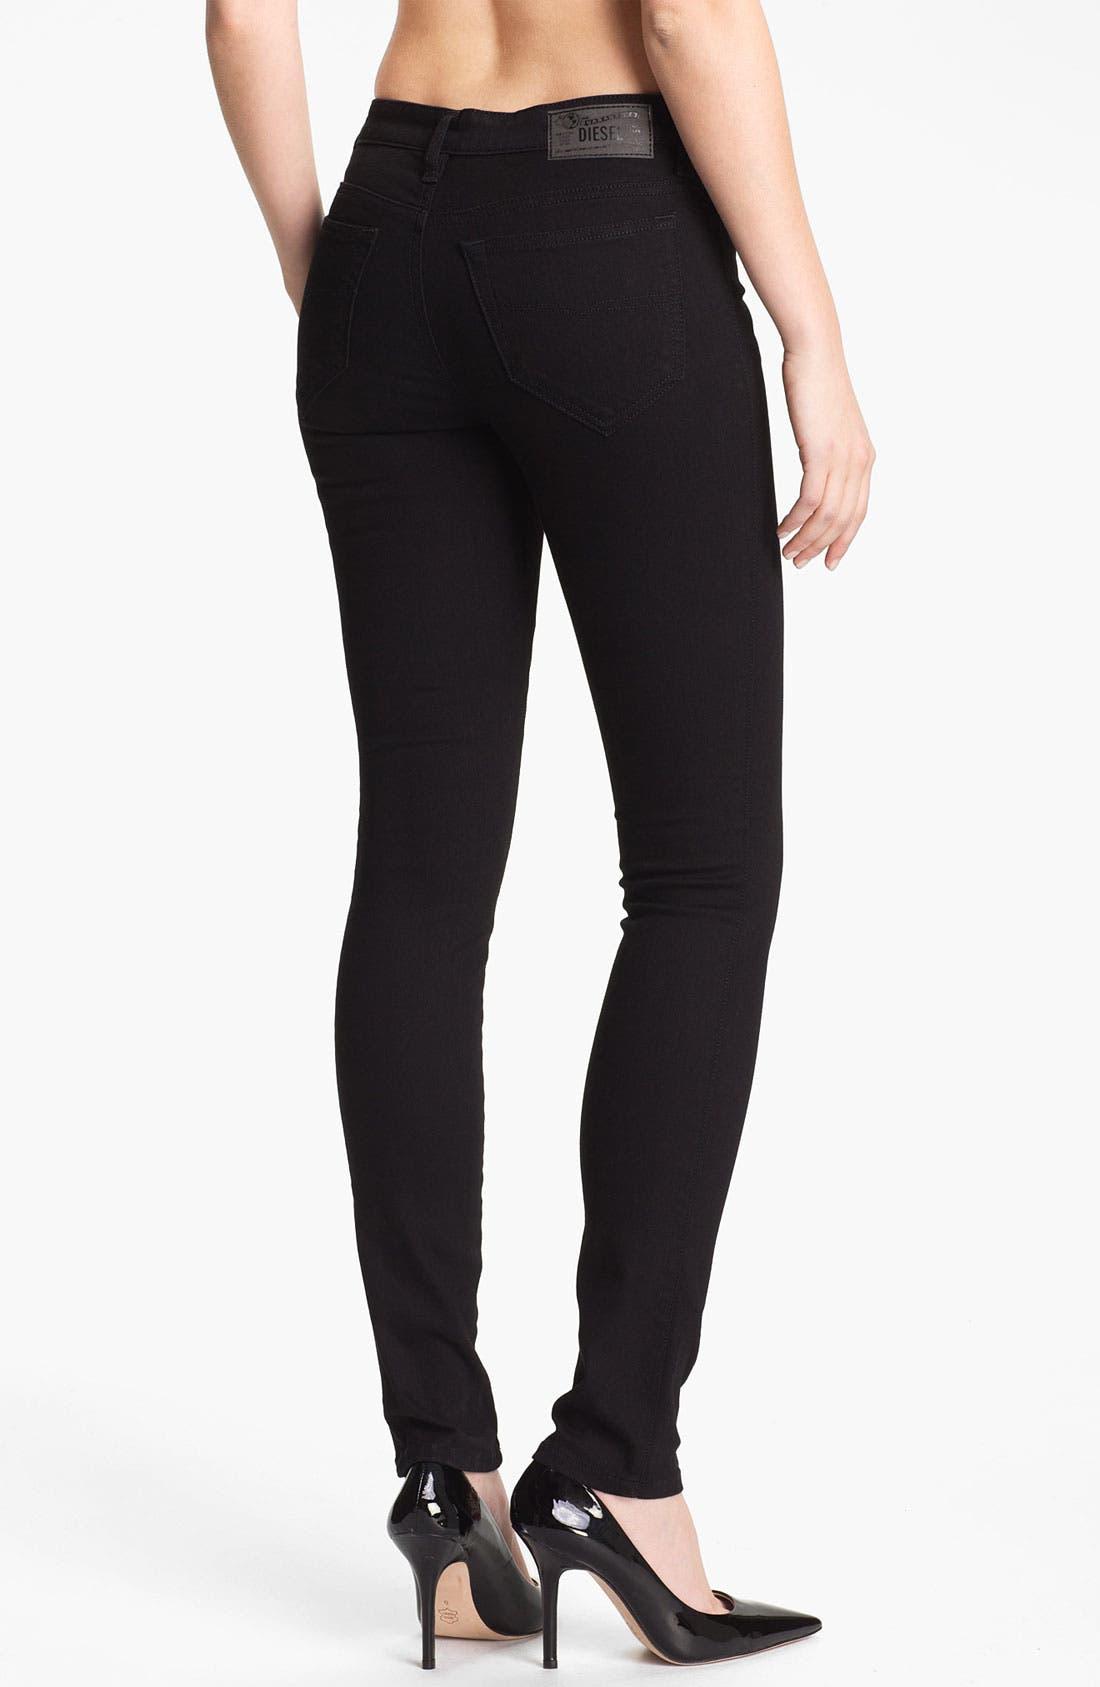 Alternate Image 2  - DIESEL® 'Skinzee' Stretch Skinny Jeans (Black)